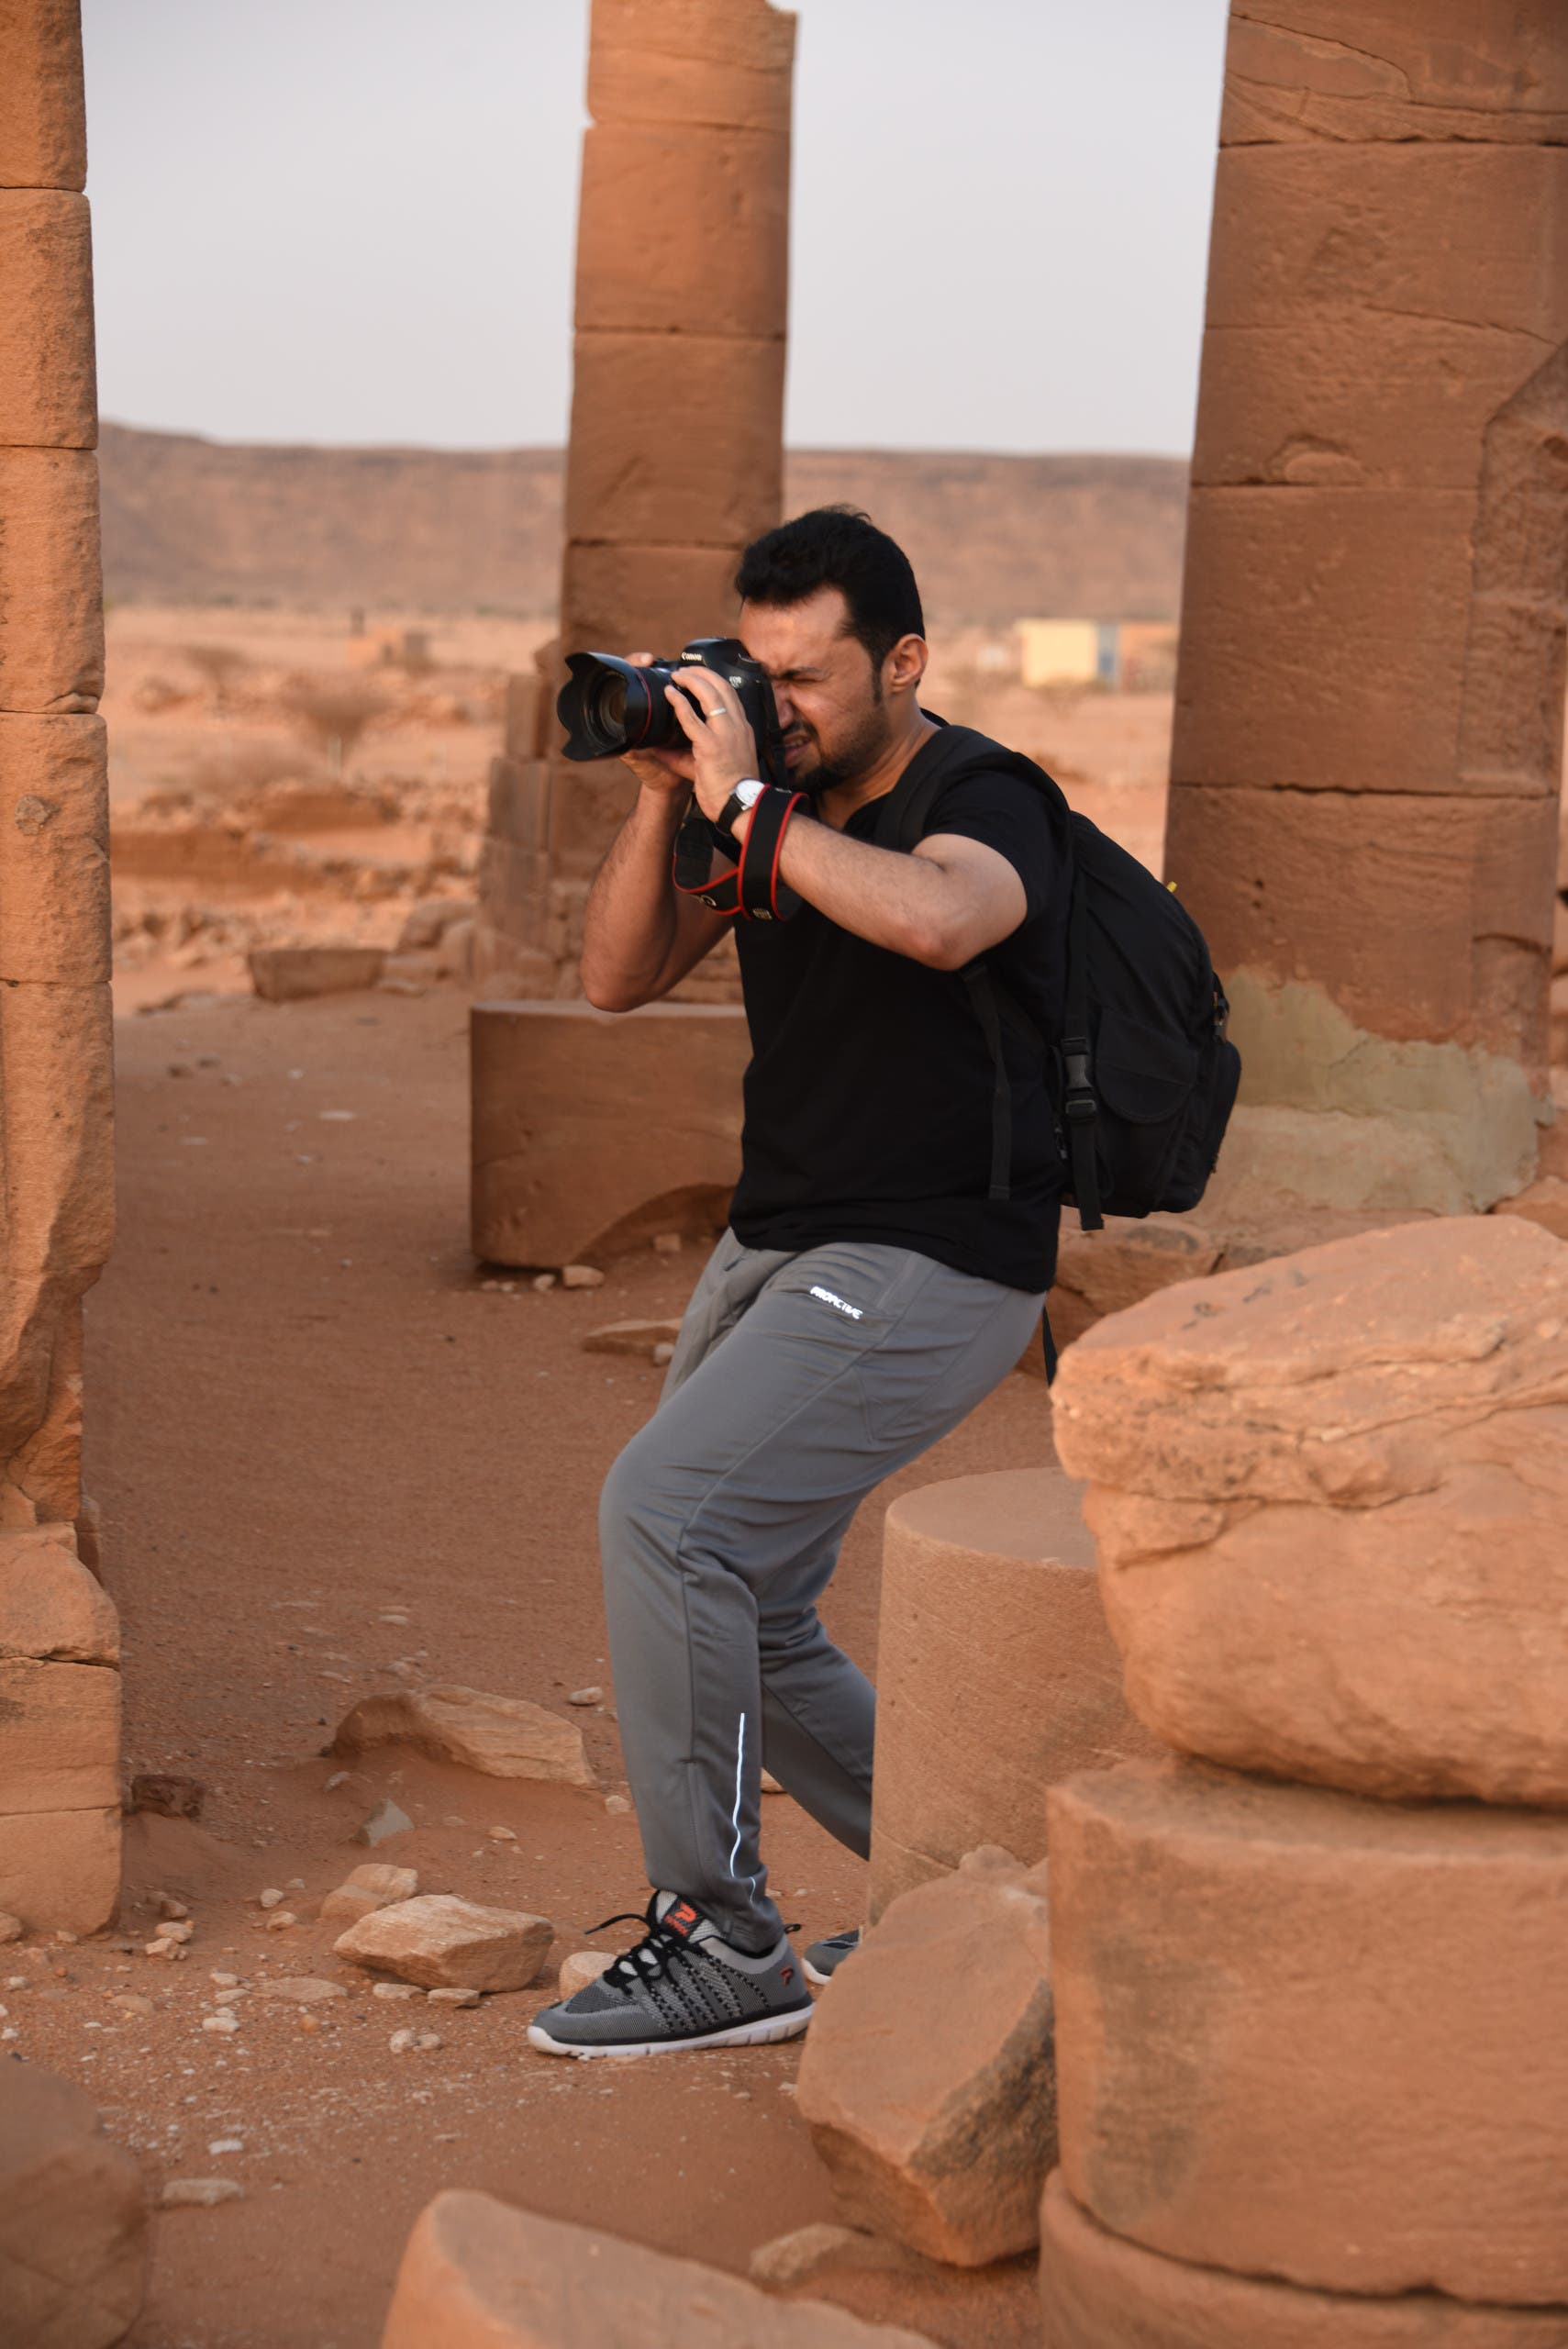 سعوديان تجولا بالسودان.. وكانت هذه الصور المدهشة! 8d43c2ea-a573-45b4-ad77-b8f16ebfa945